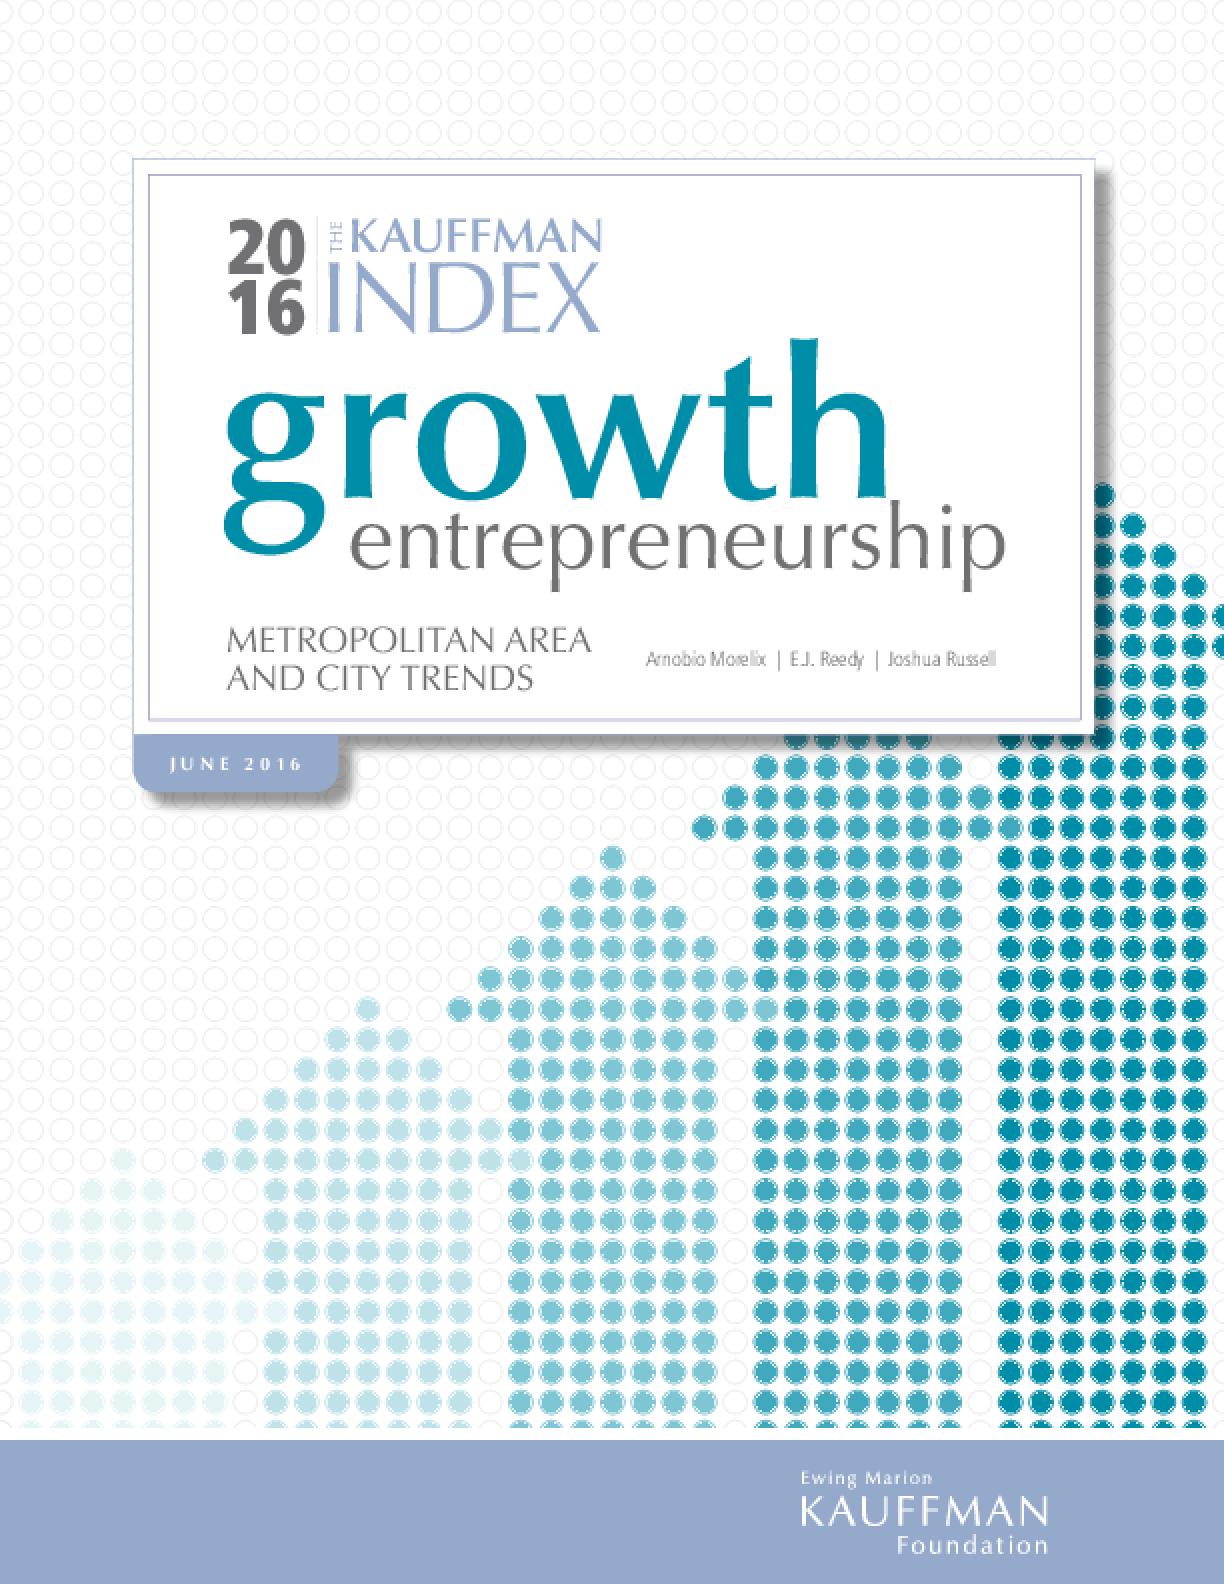 The Kauffman Index 2016: Growth Entrepreneurship - Metropolitan Area and City Trends